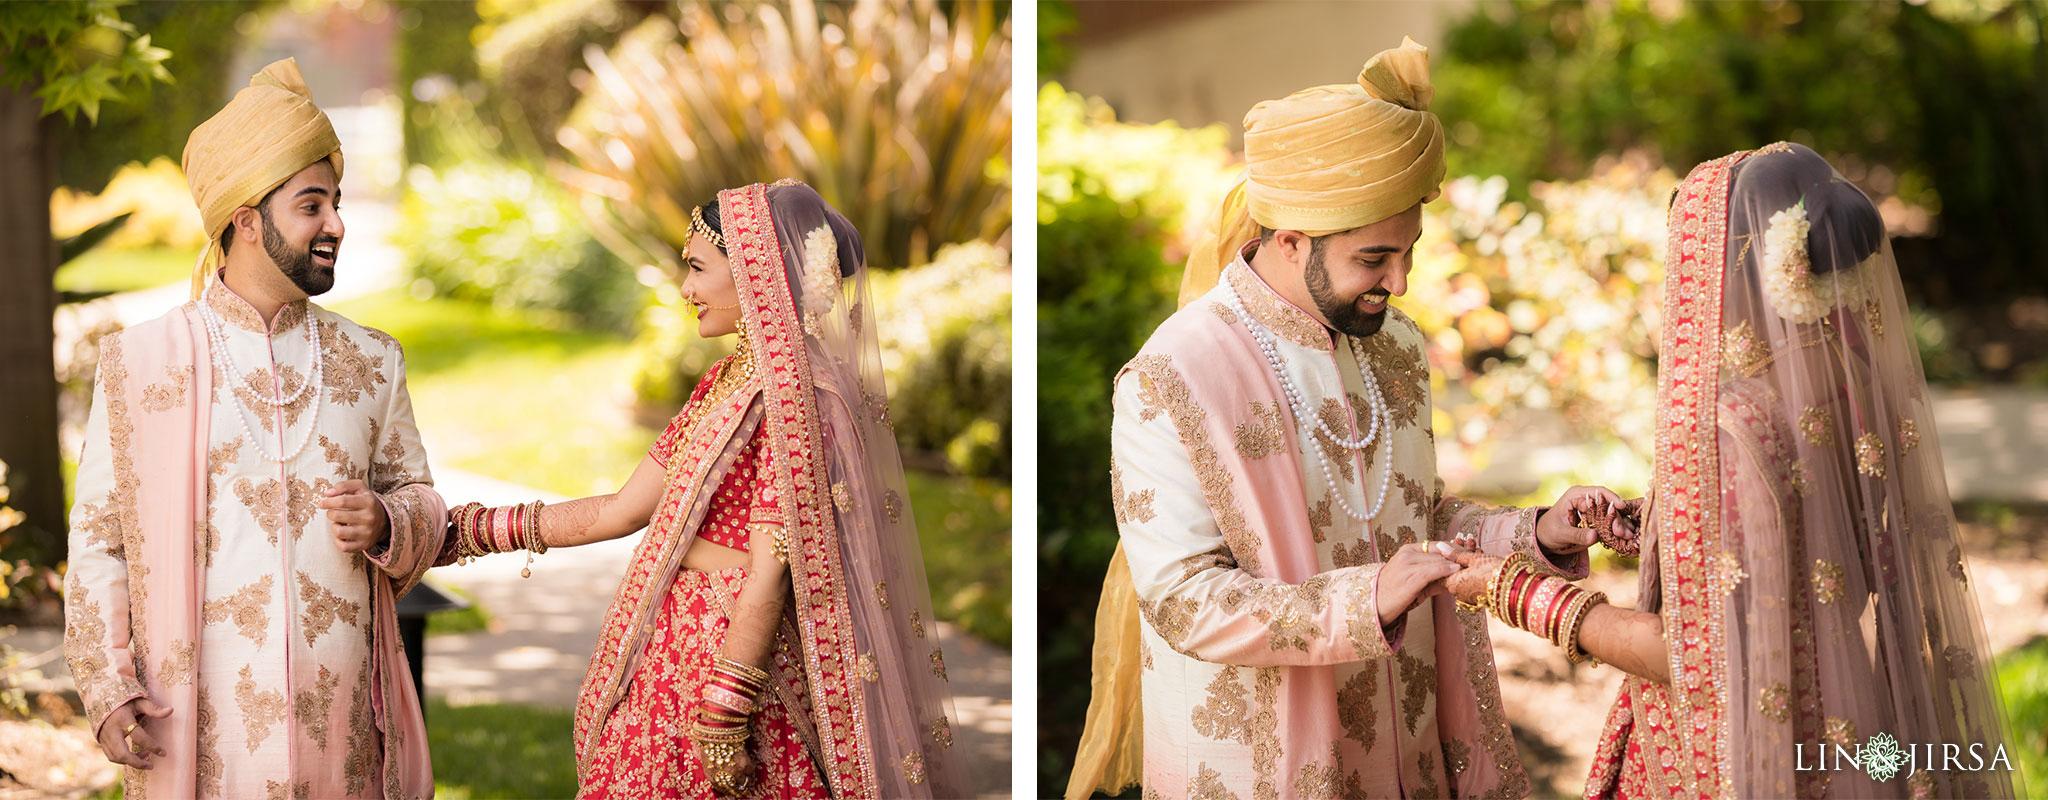 14 four seasons westlake village indian wedding photography